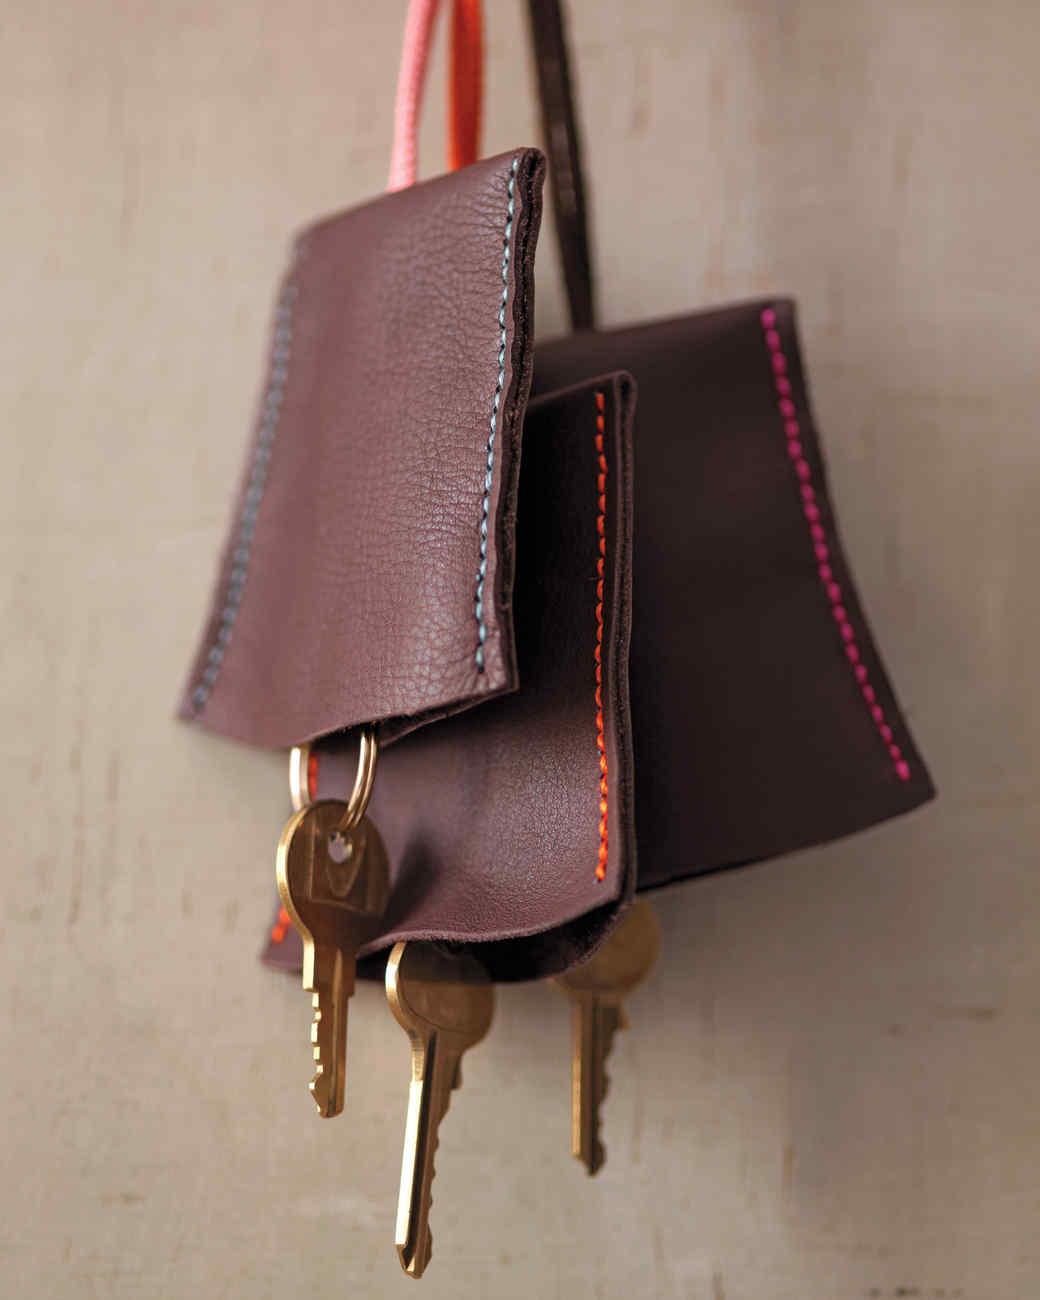 leather-keychain-holder-023-md110598.jpg